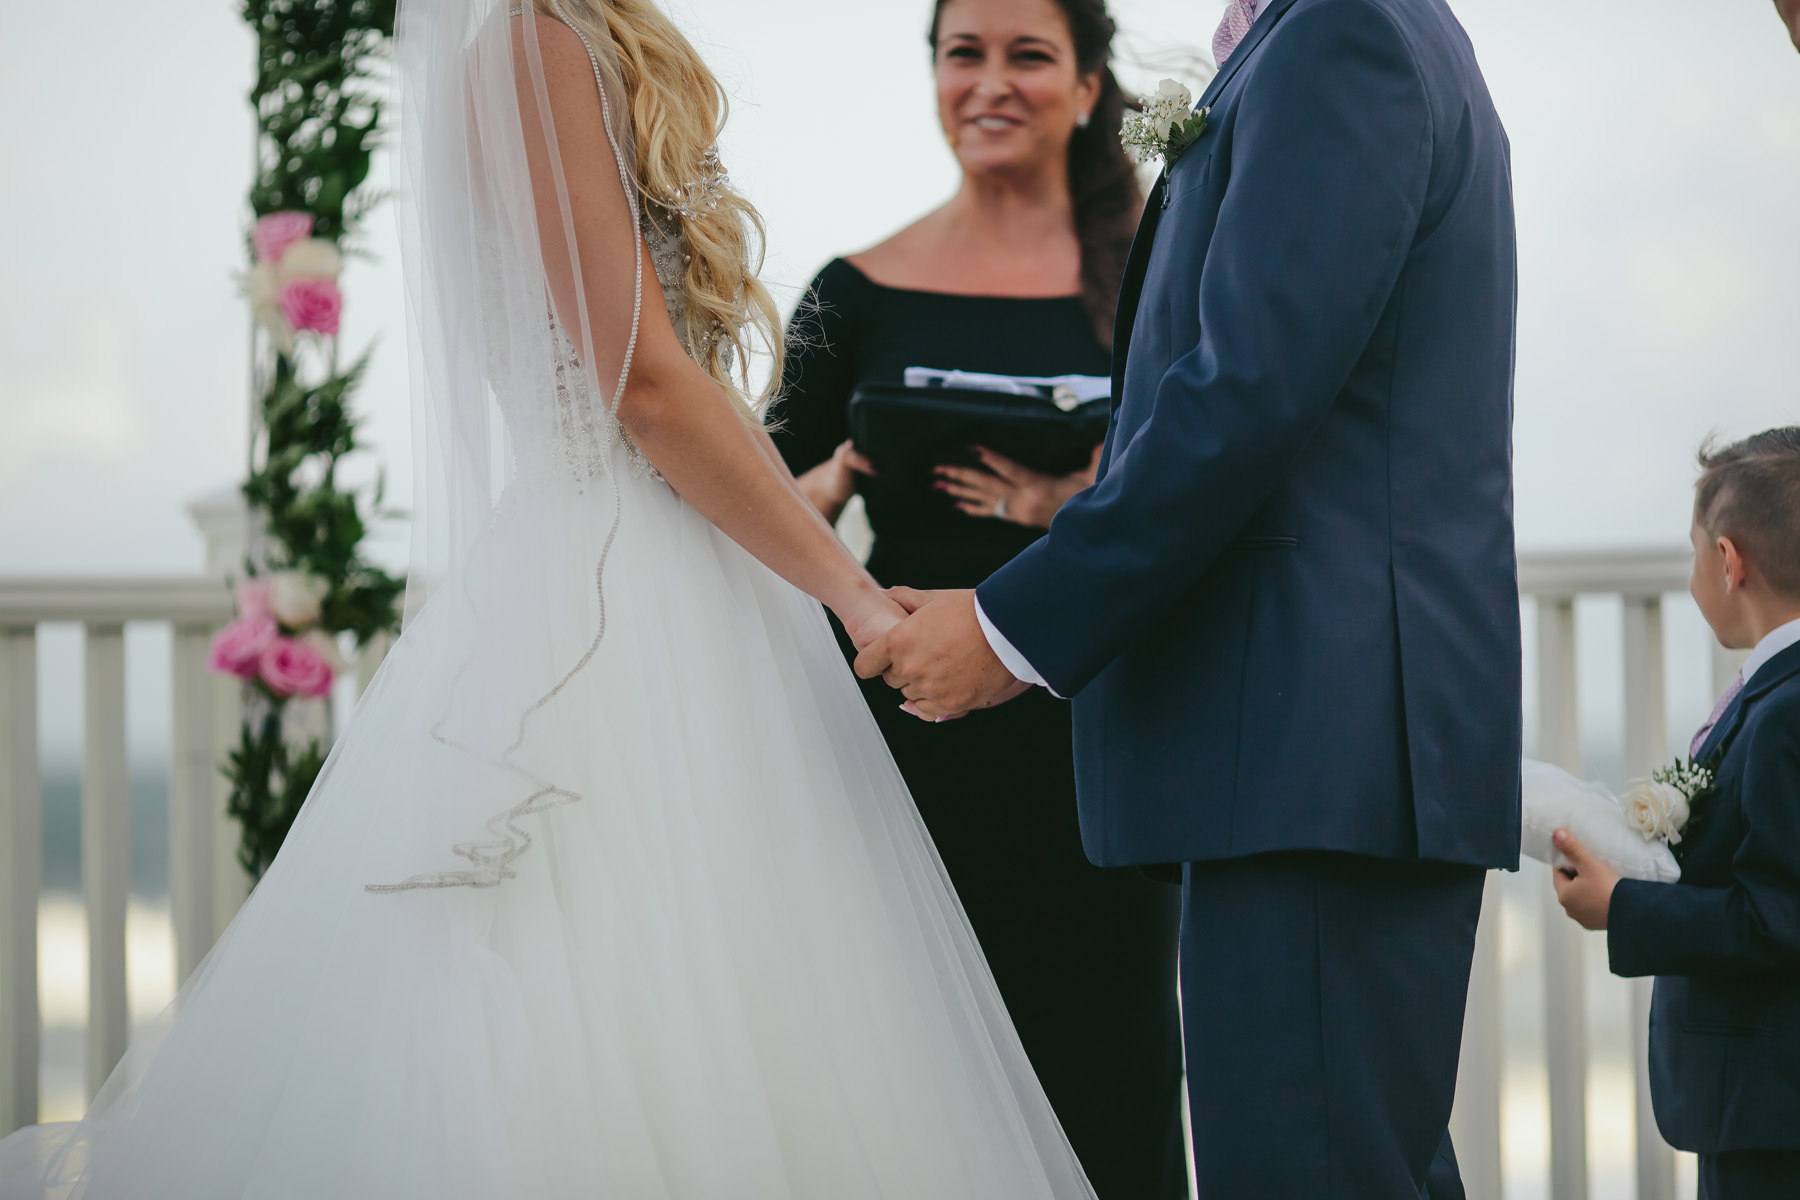 bride-groom-holding-hands-ceremony-destination-wedding-tiny-house-photo-photogrpaher.jpg